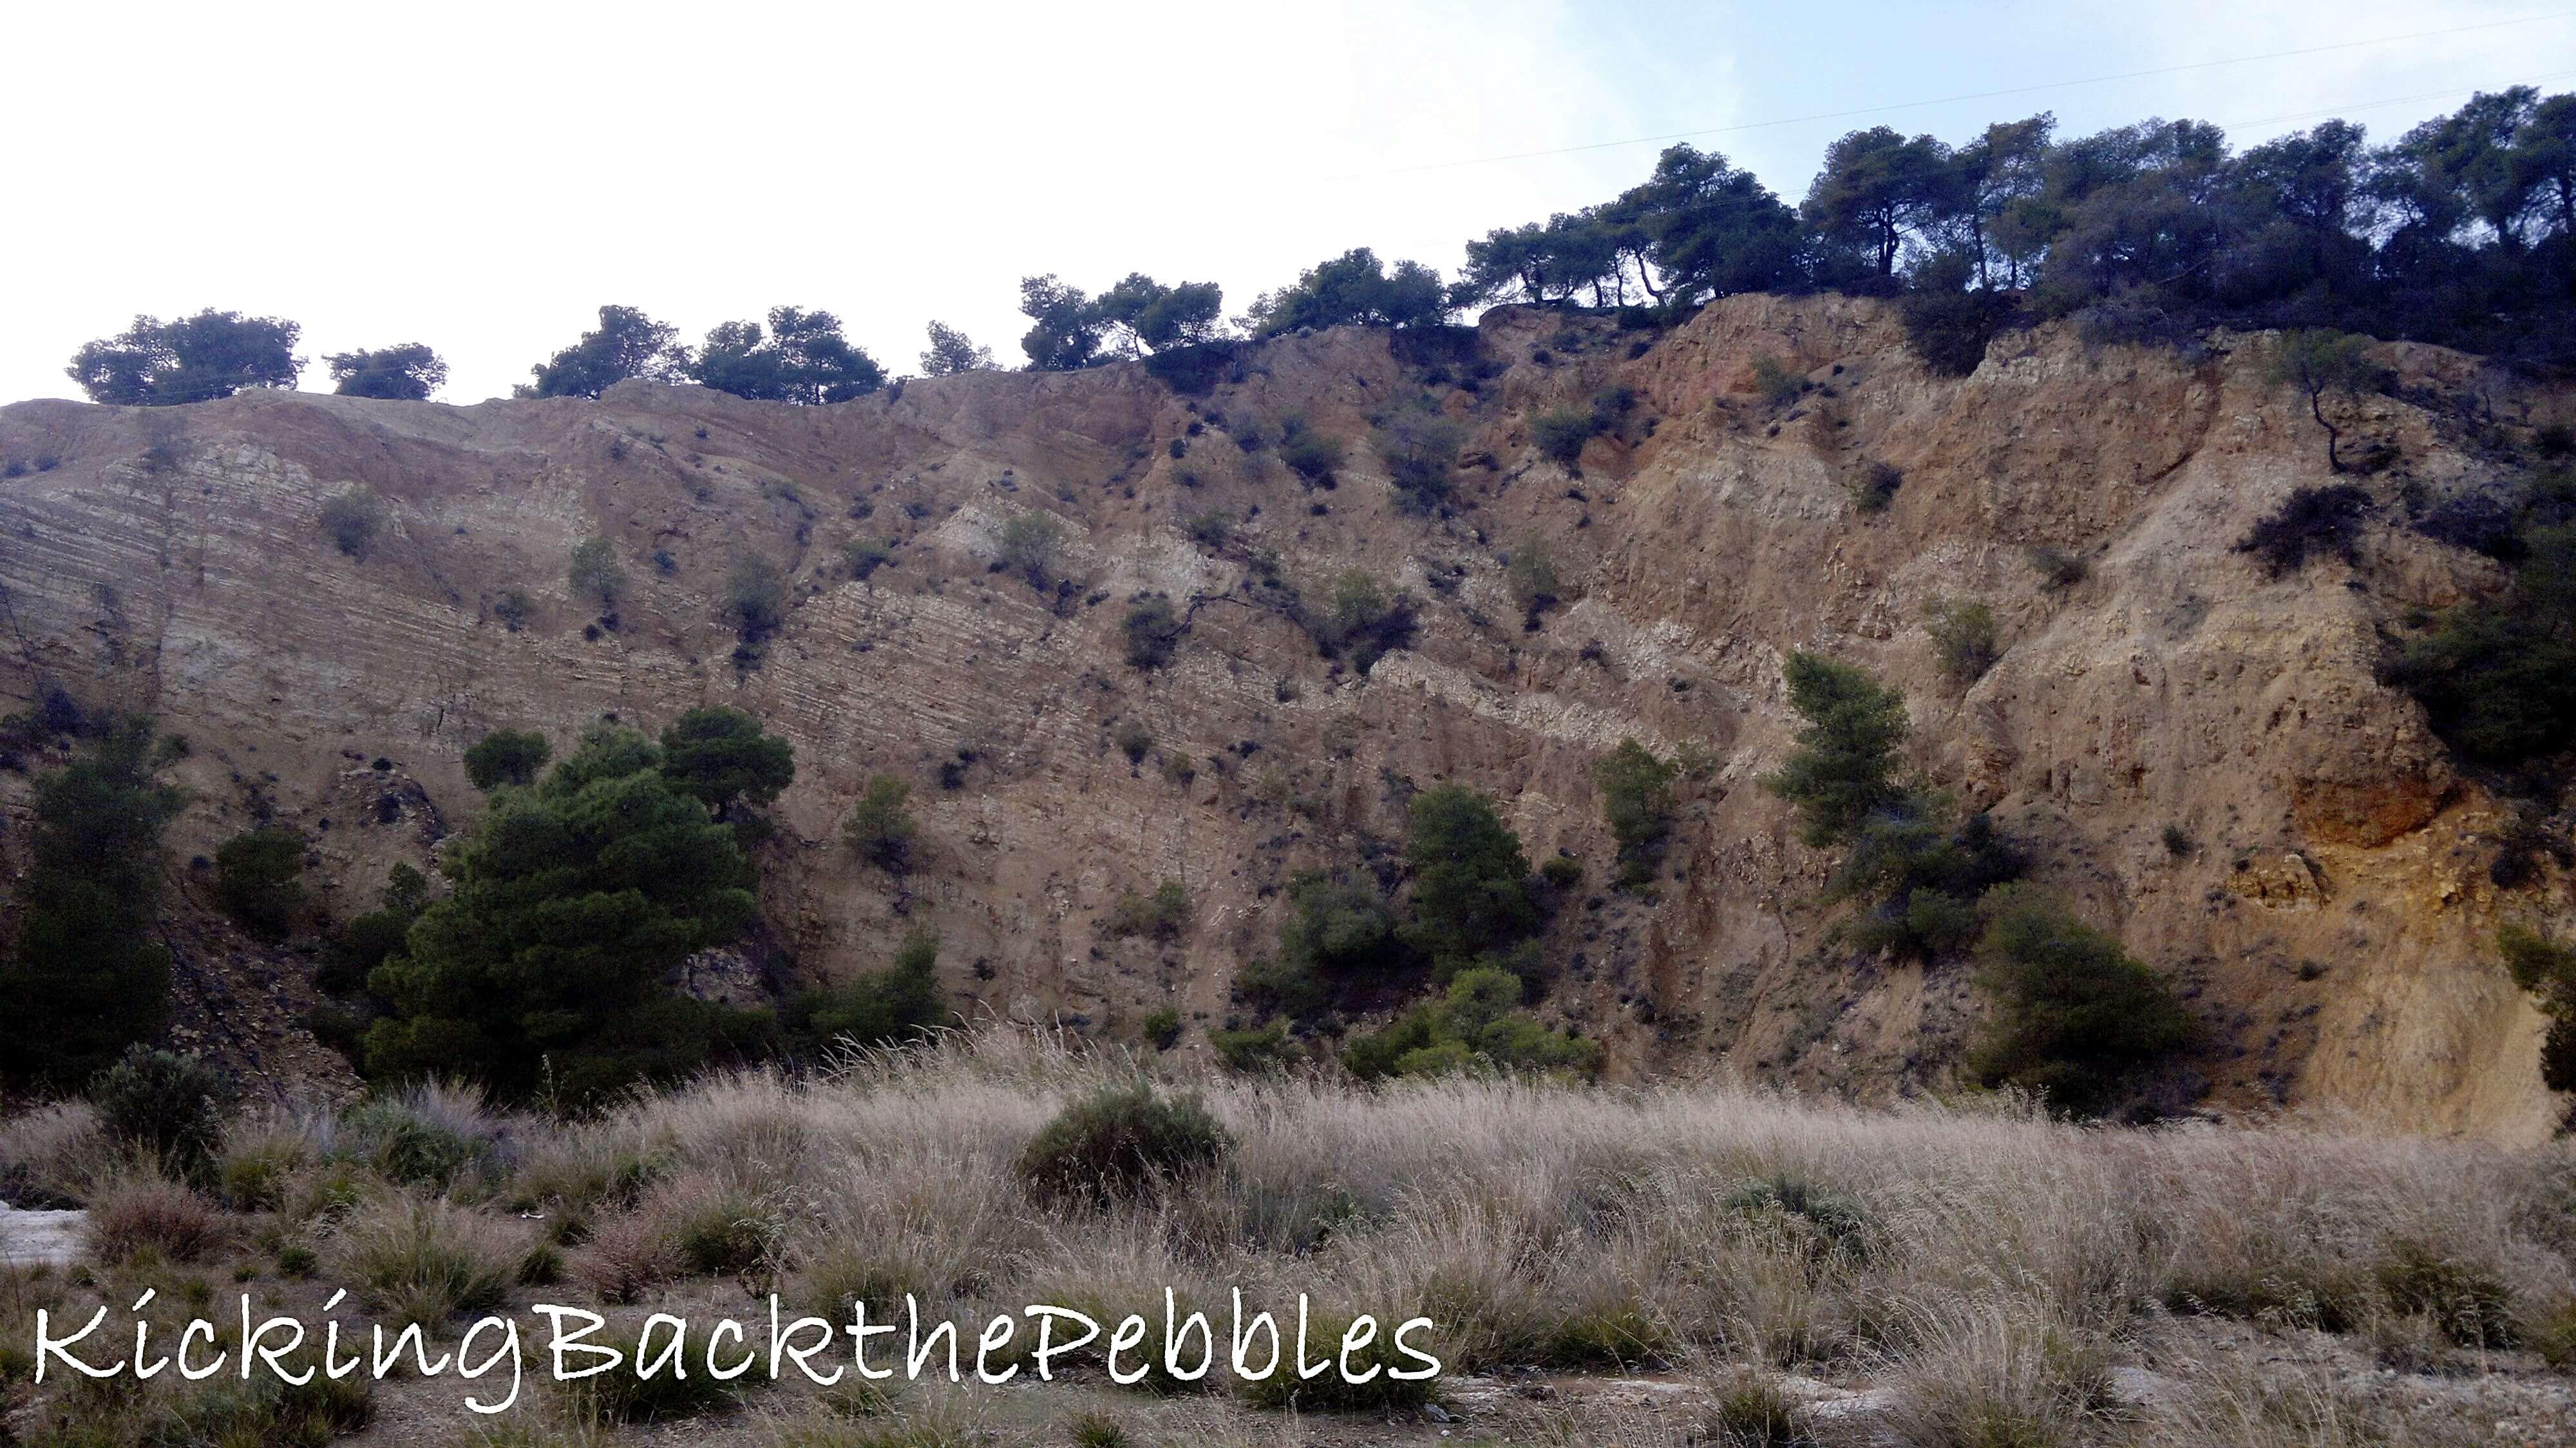 Sousaki - Attica | Kicking Back the Pebbles